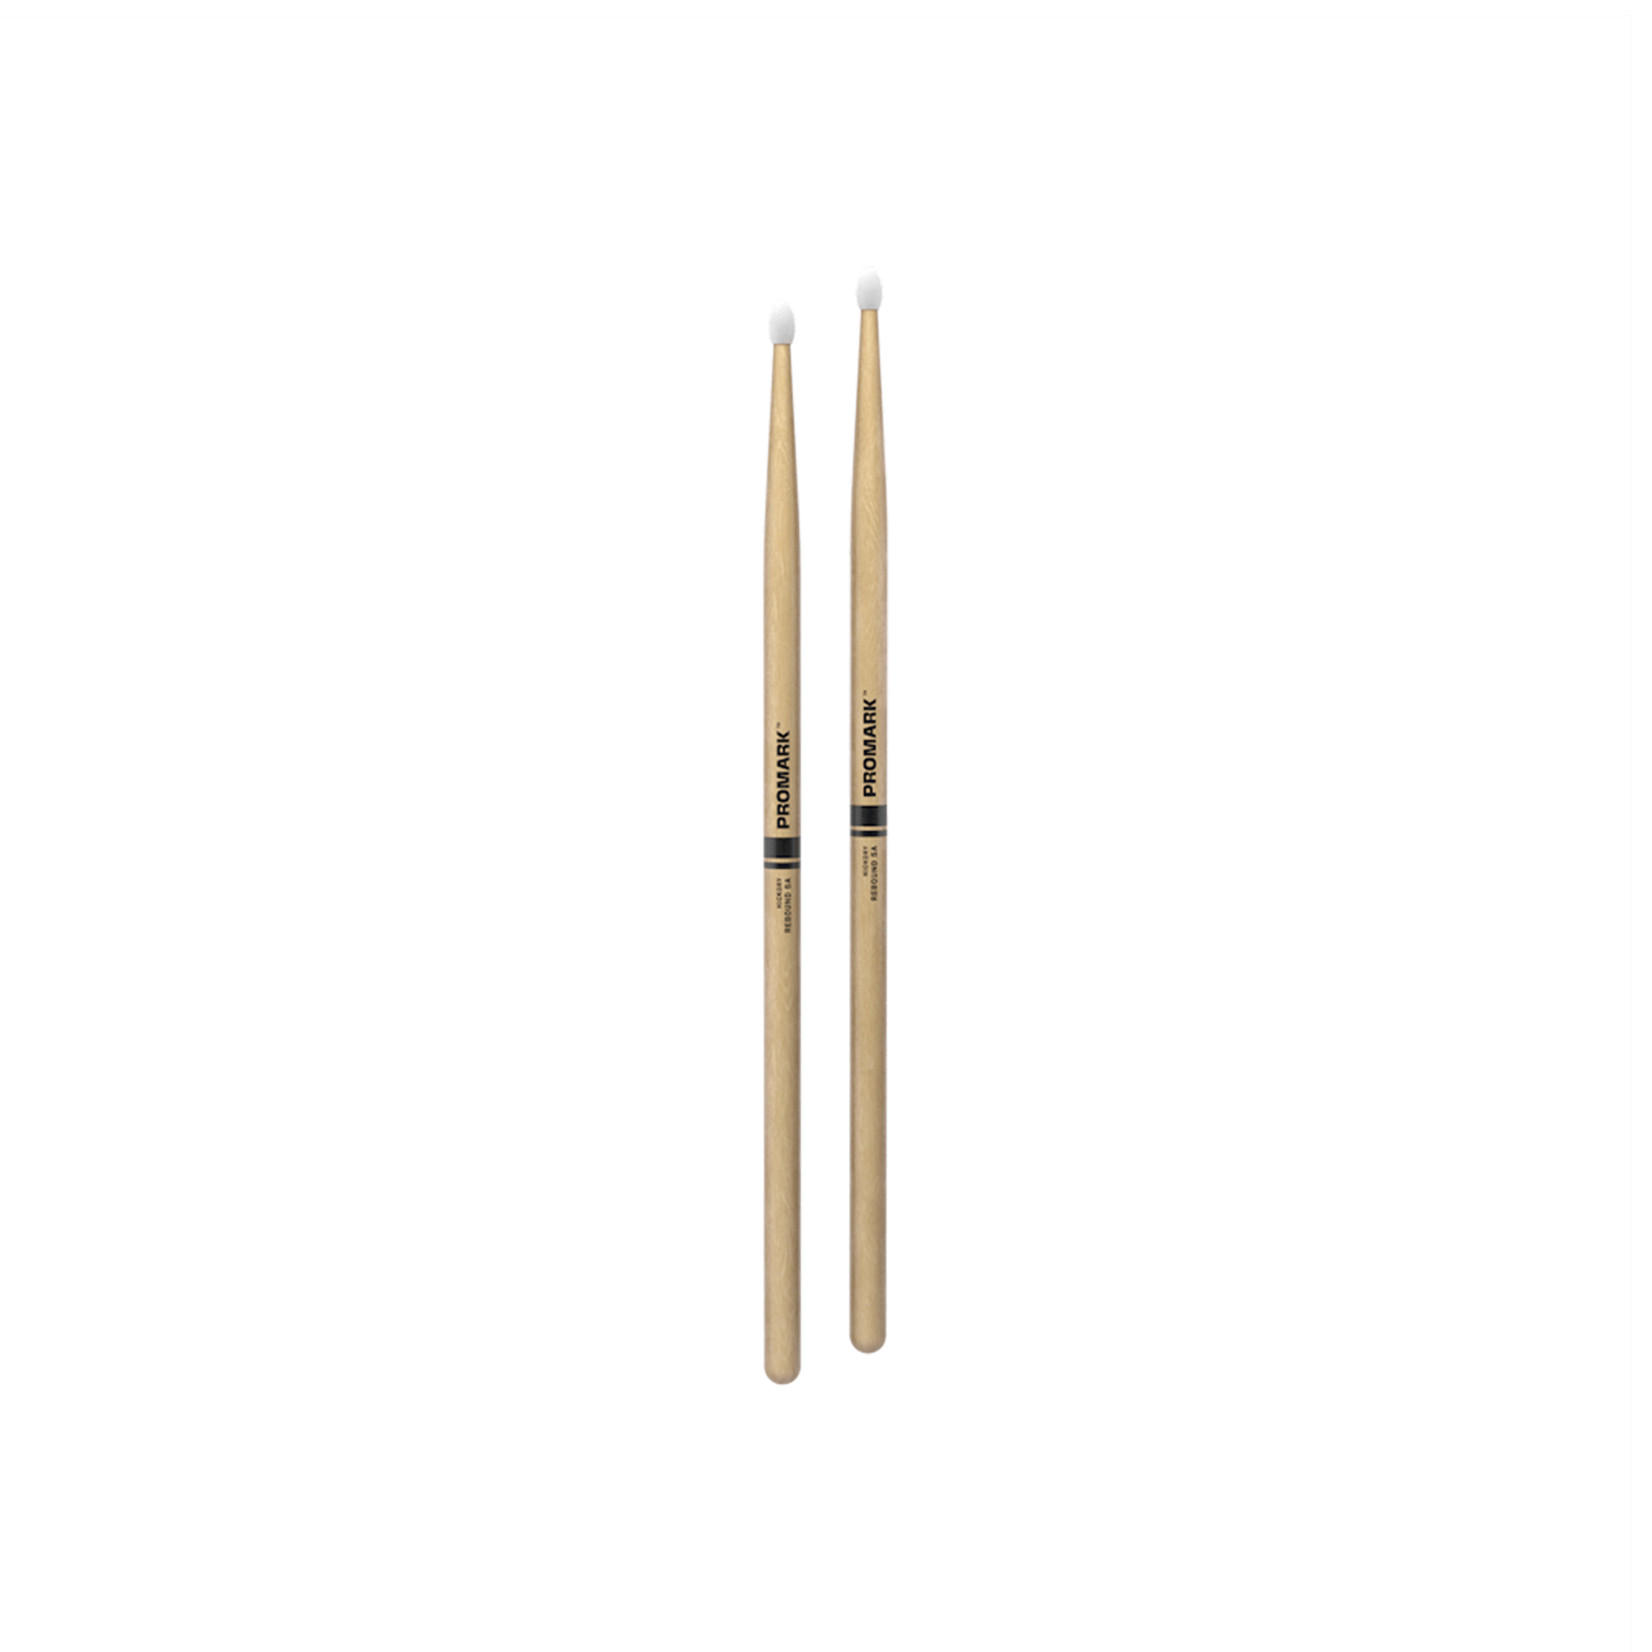 Promark ProMark Rebound 5A Hickory Nylon Tip Drumstick